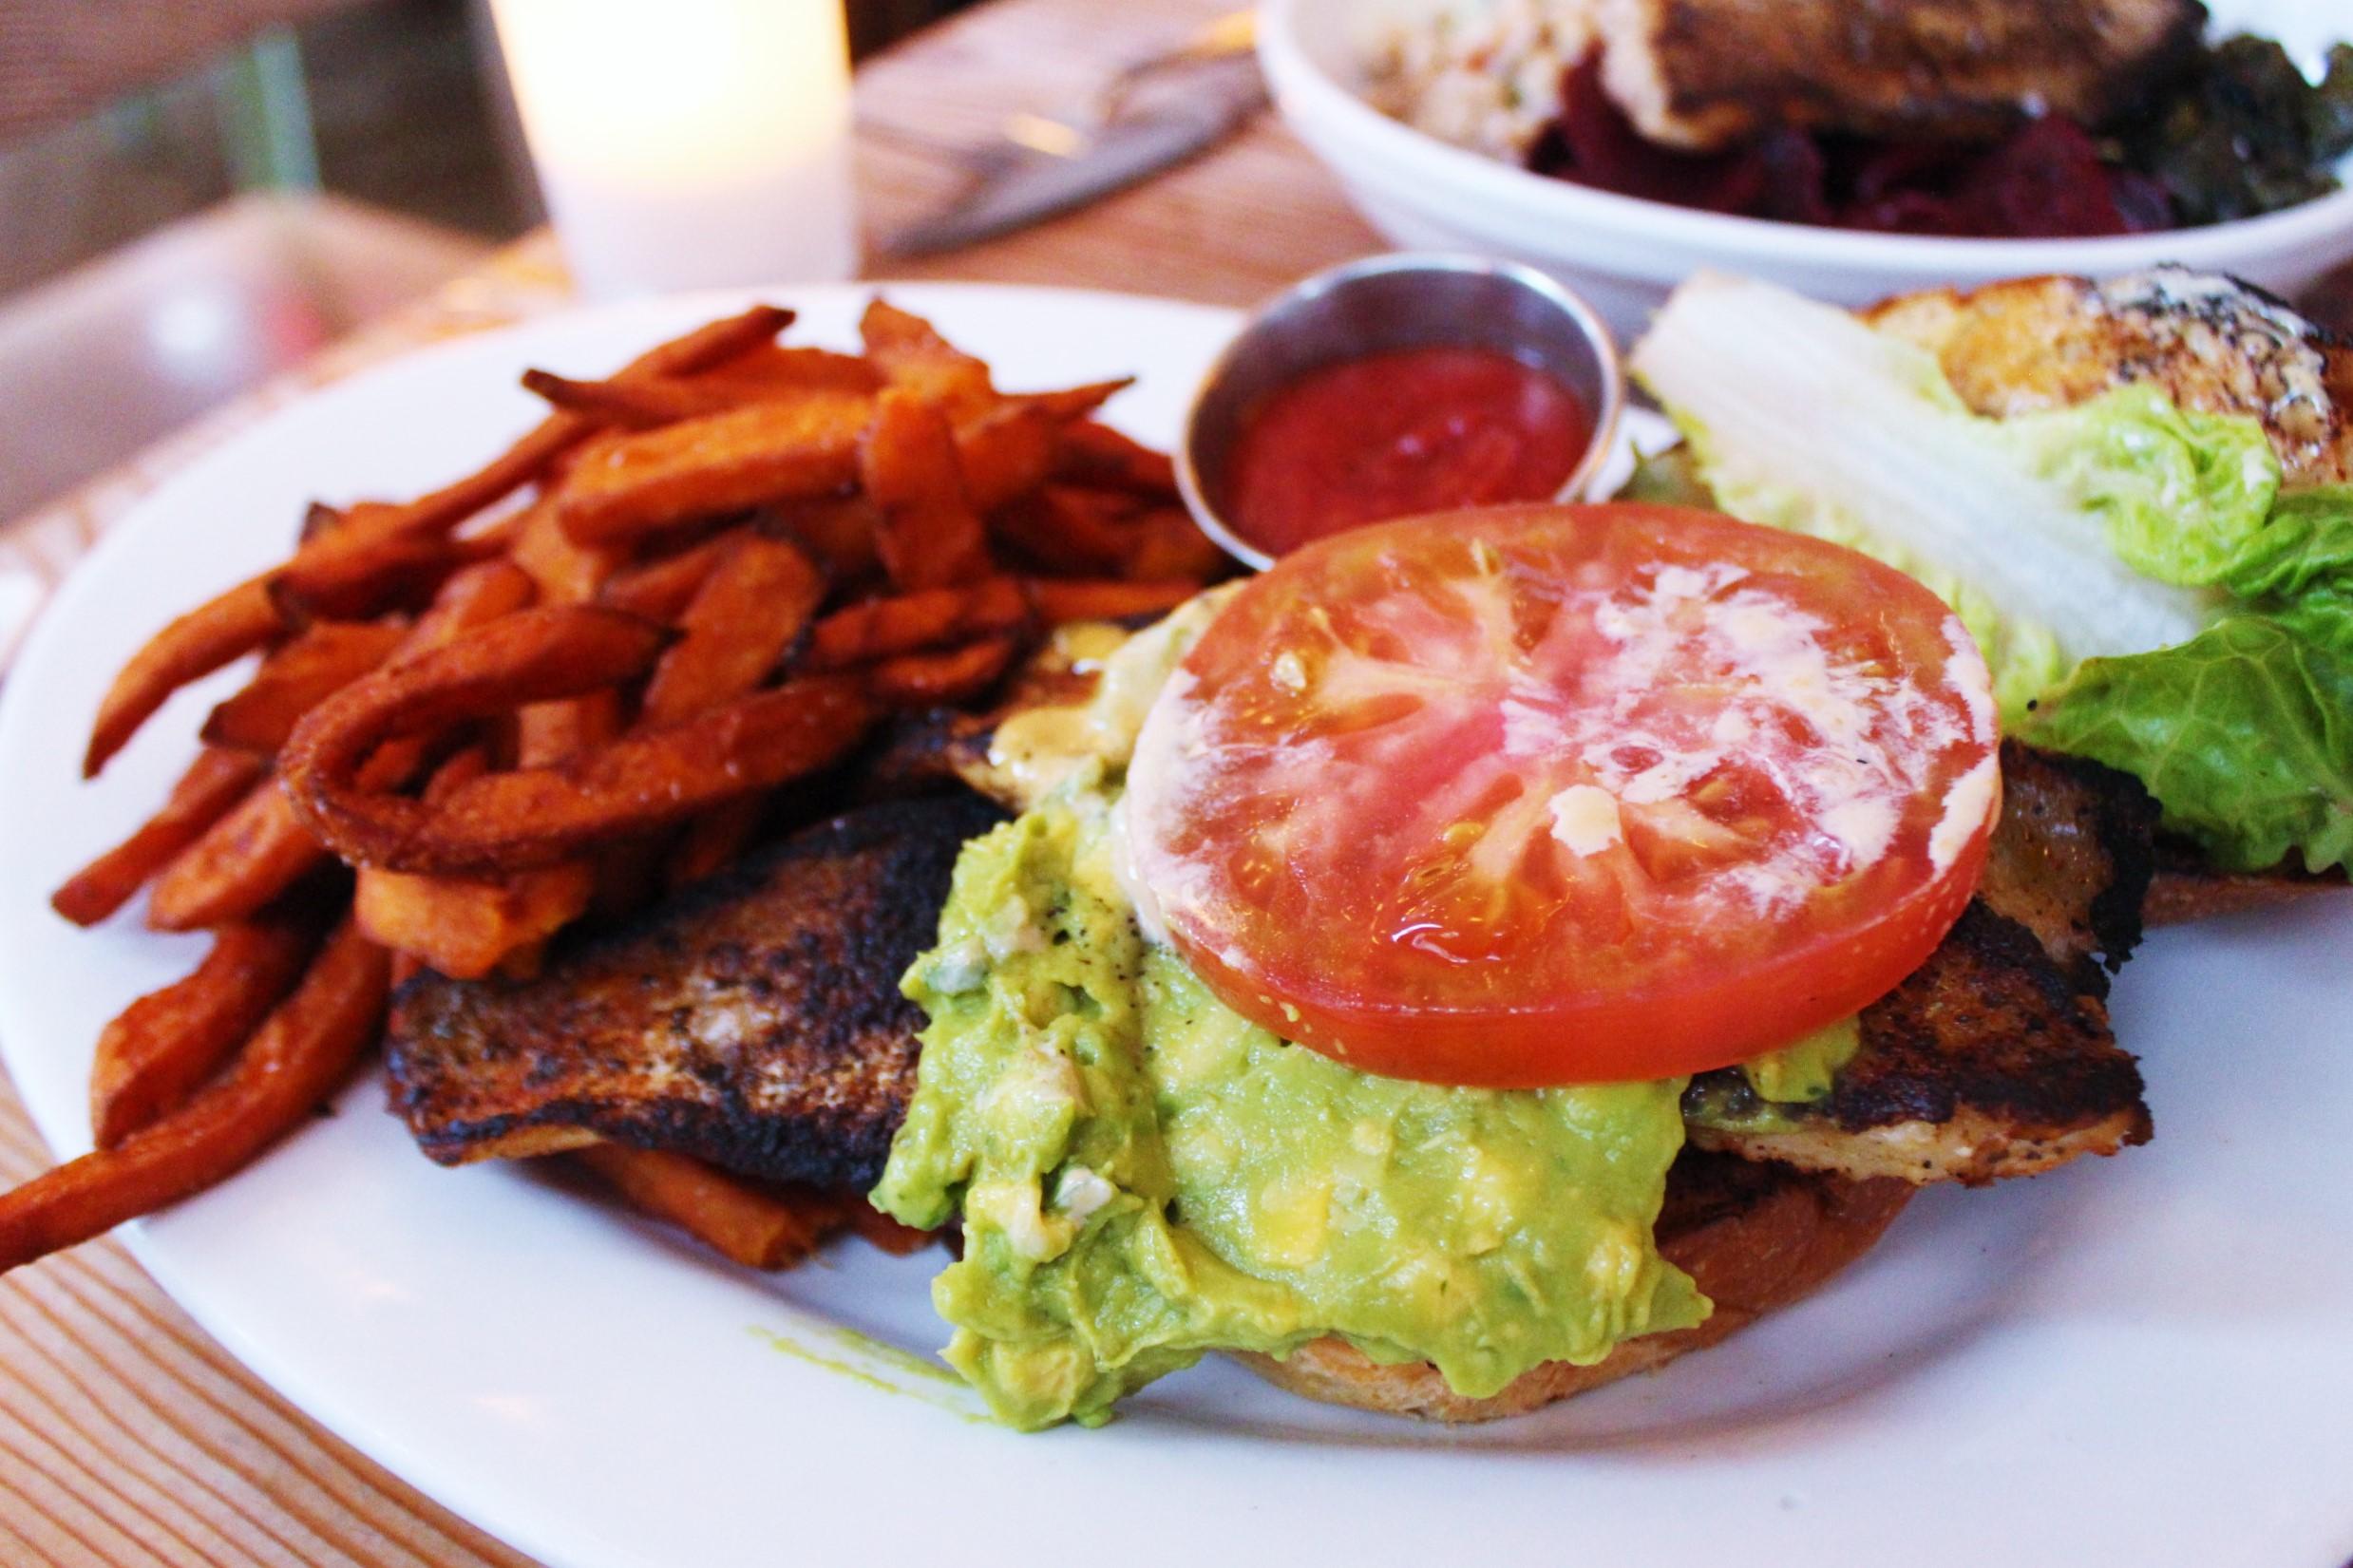 Blackened Catfish Sandwich with Avocado, Citrus Aioli, Lettuce, Tomato and Sweet Potato Fries